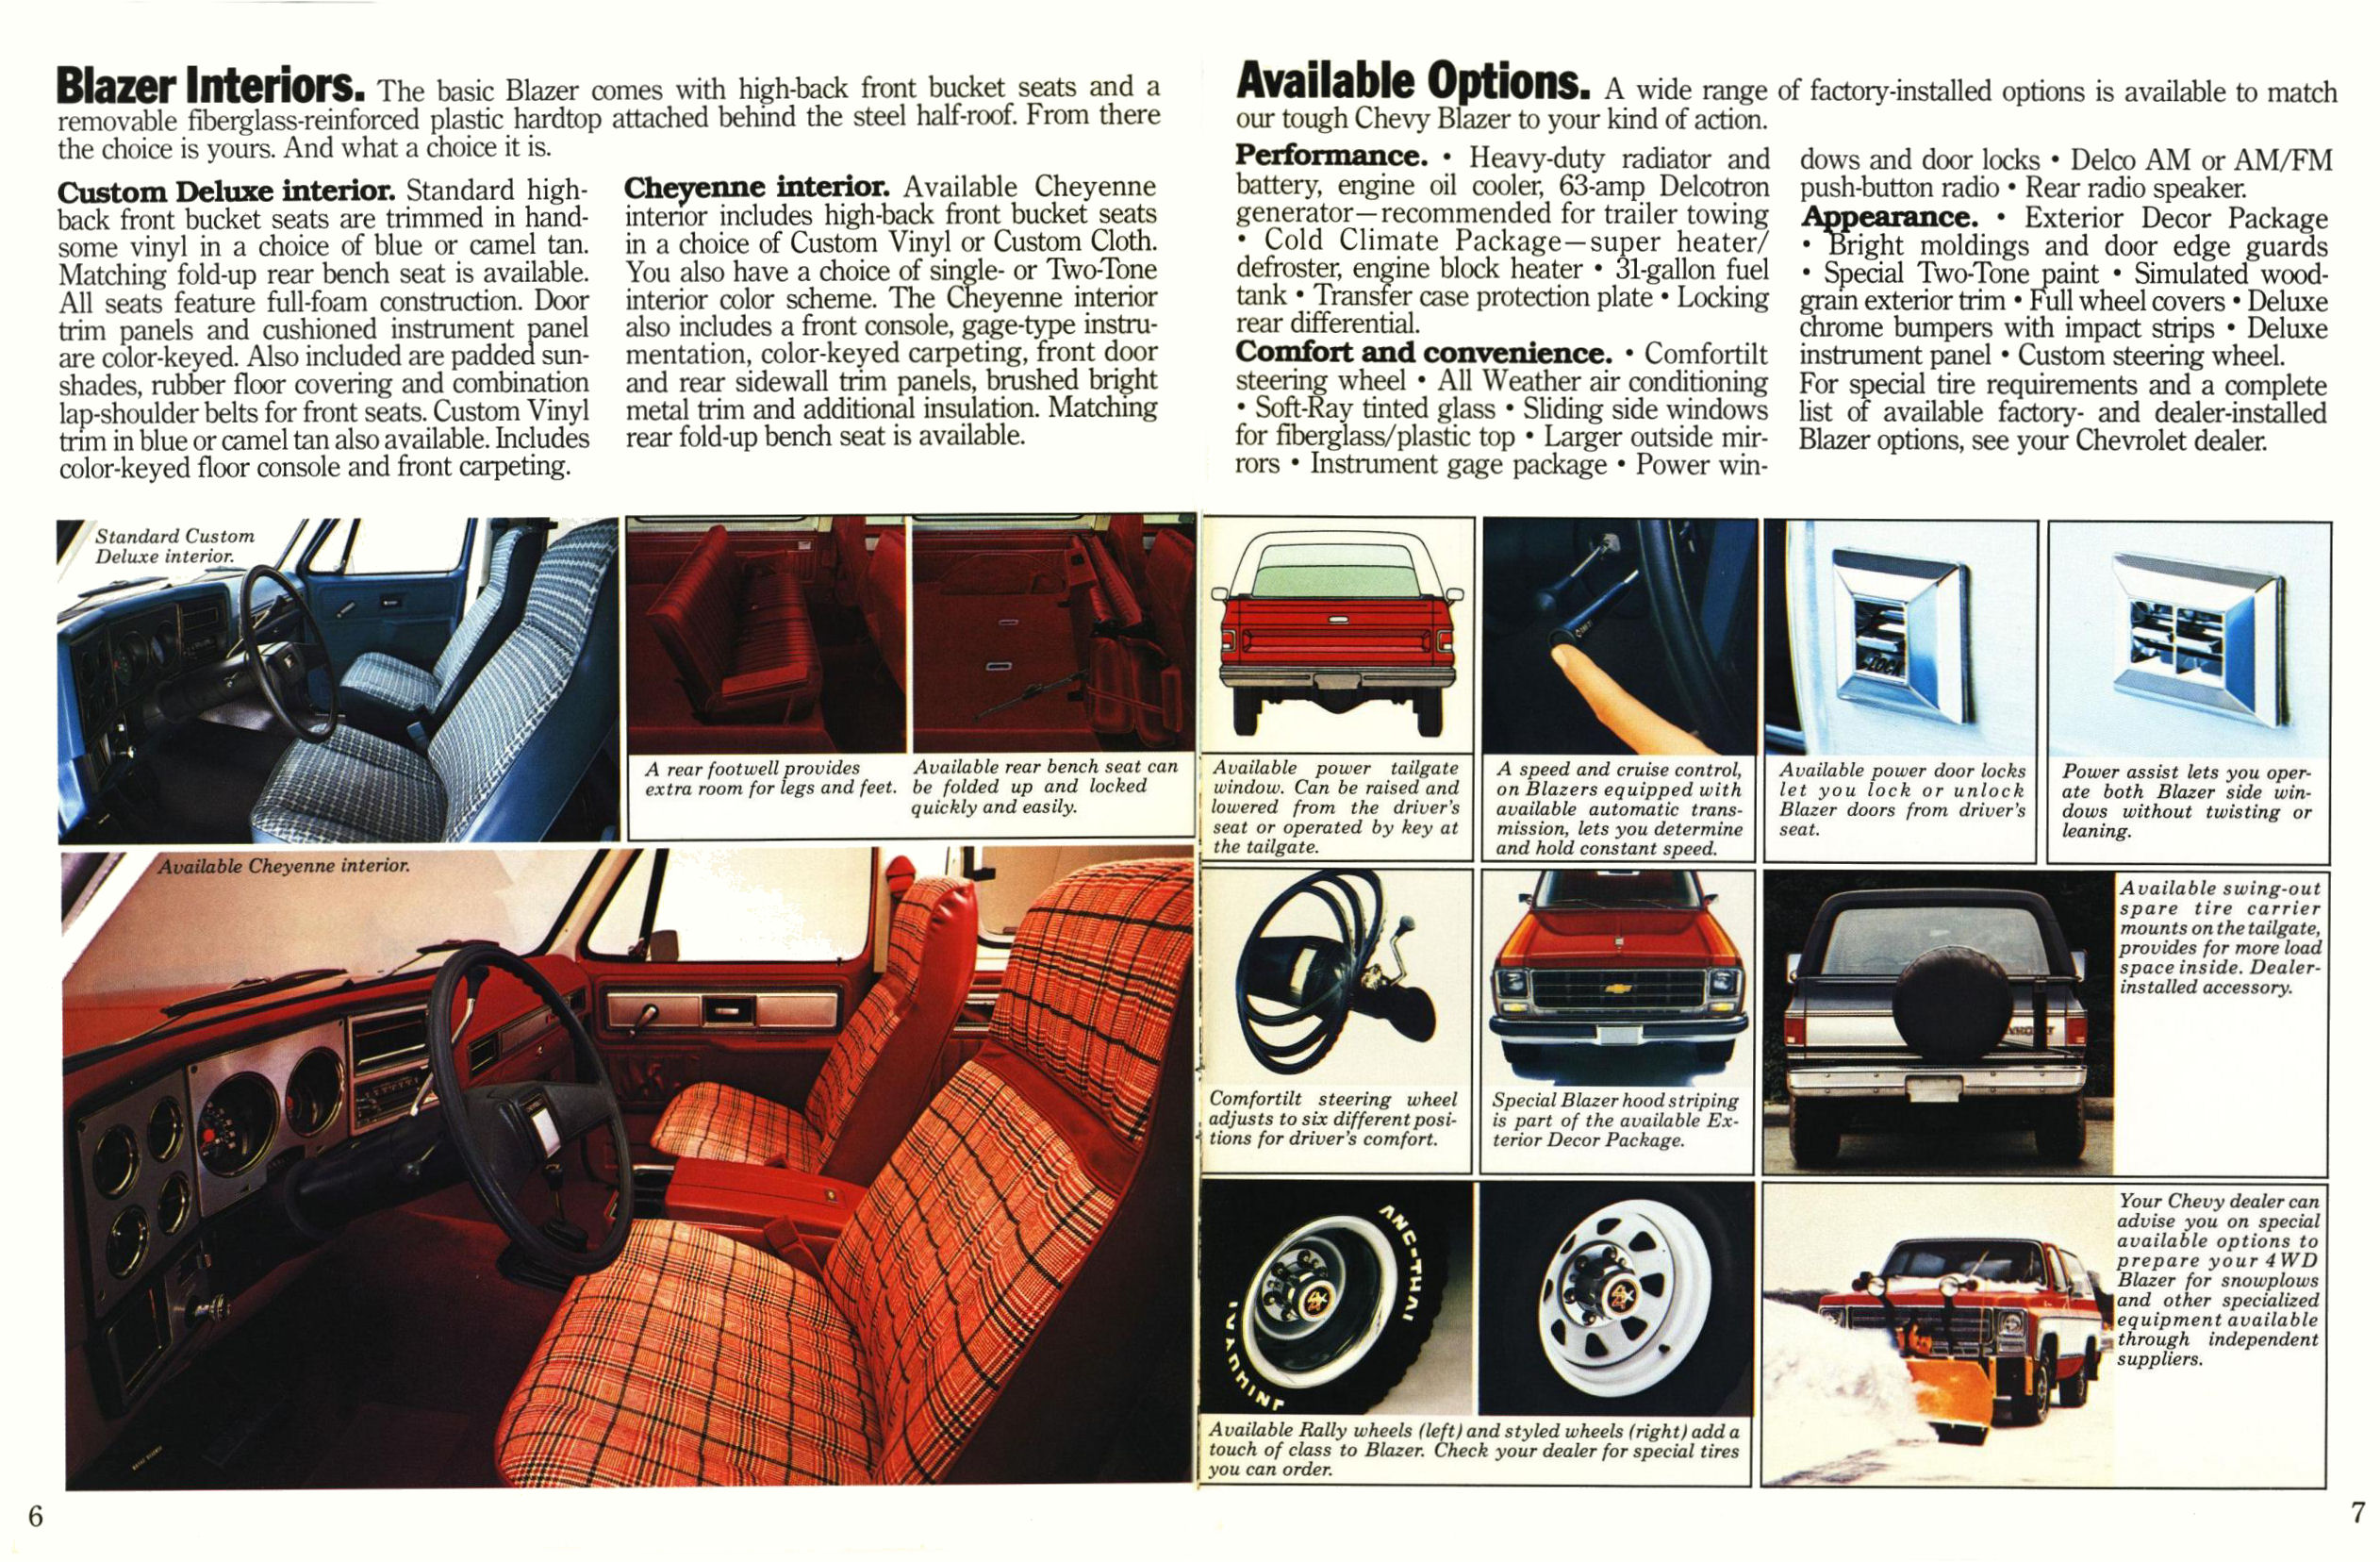 1979 Chevrolet Blazer brochure